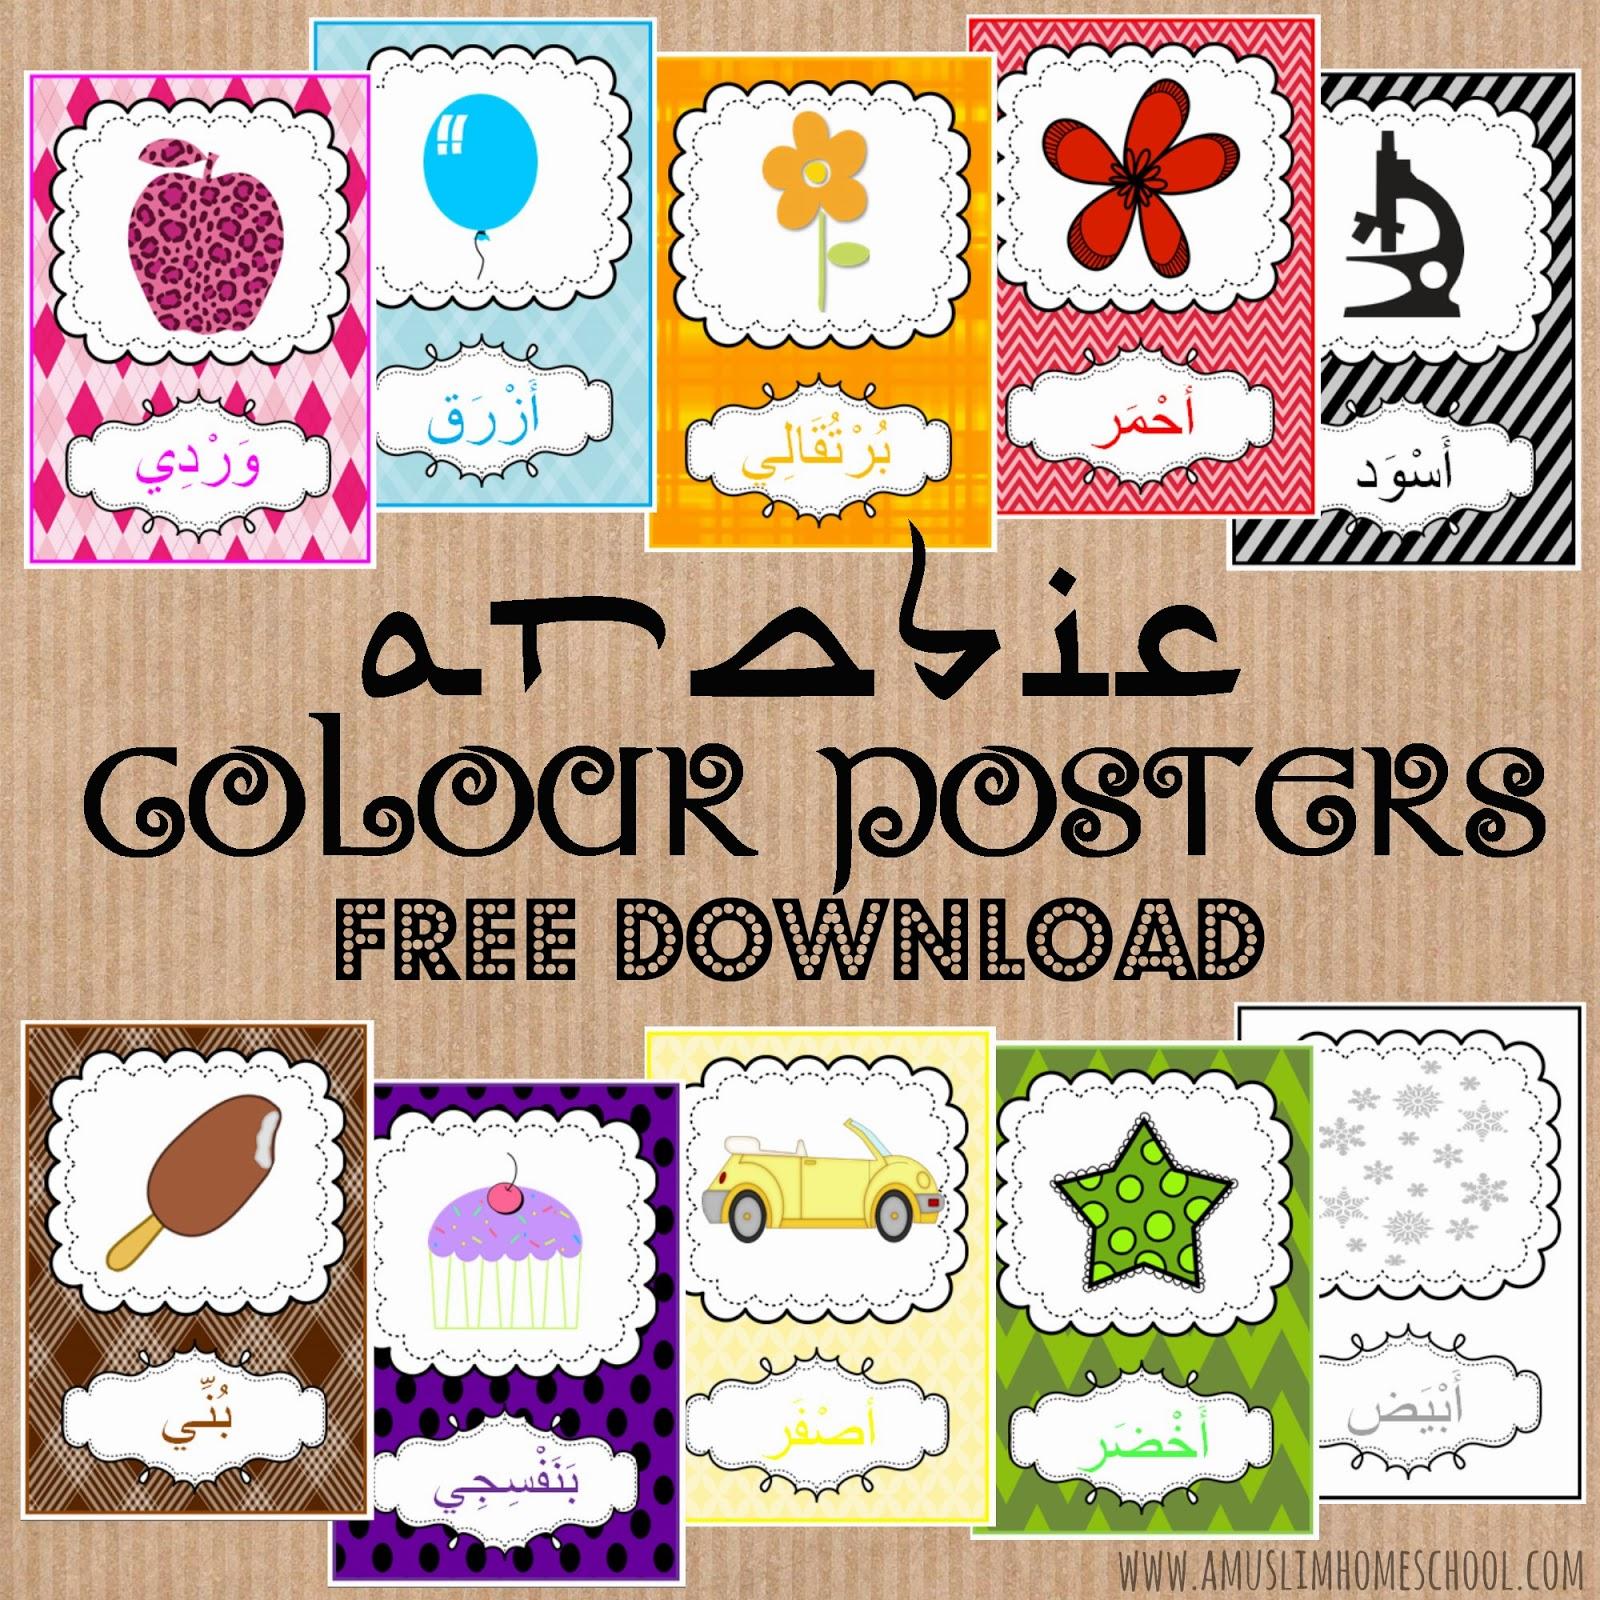 A Muslim Homeschool Printable Arabic Colour Posters